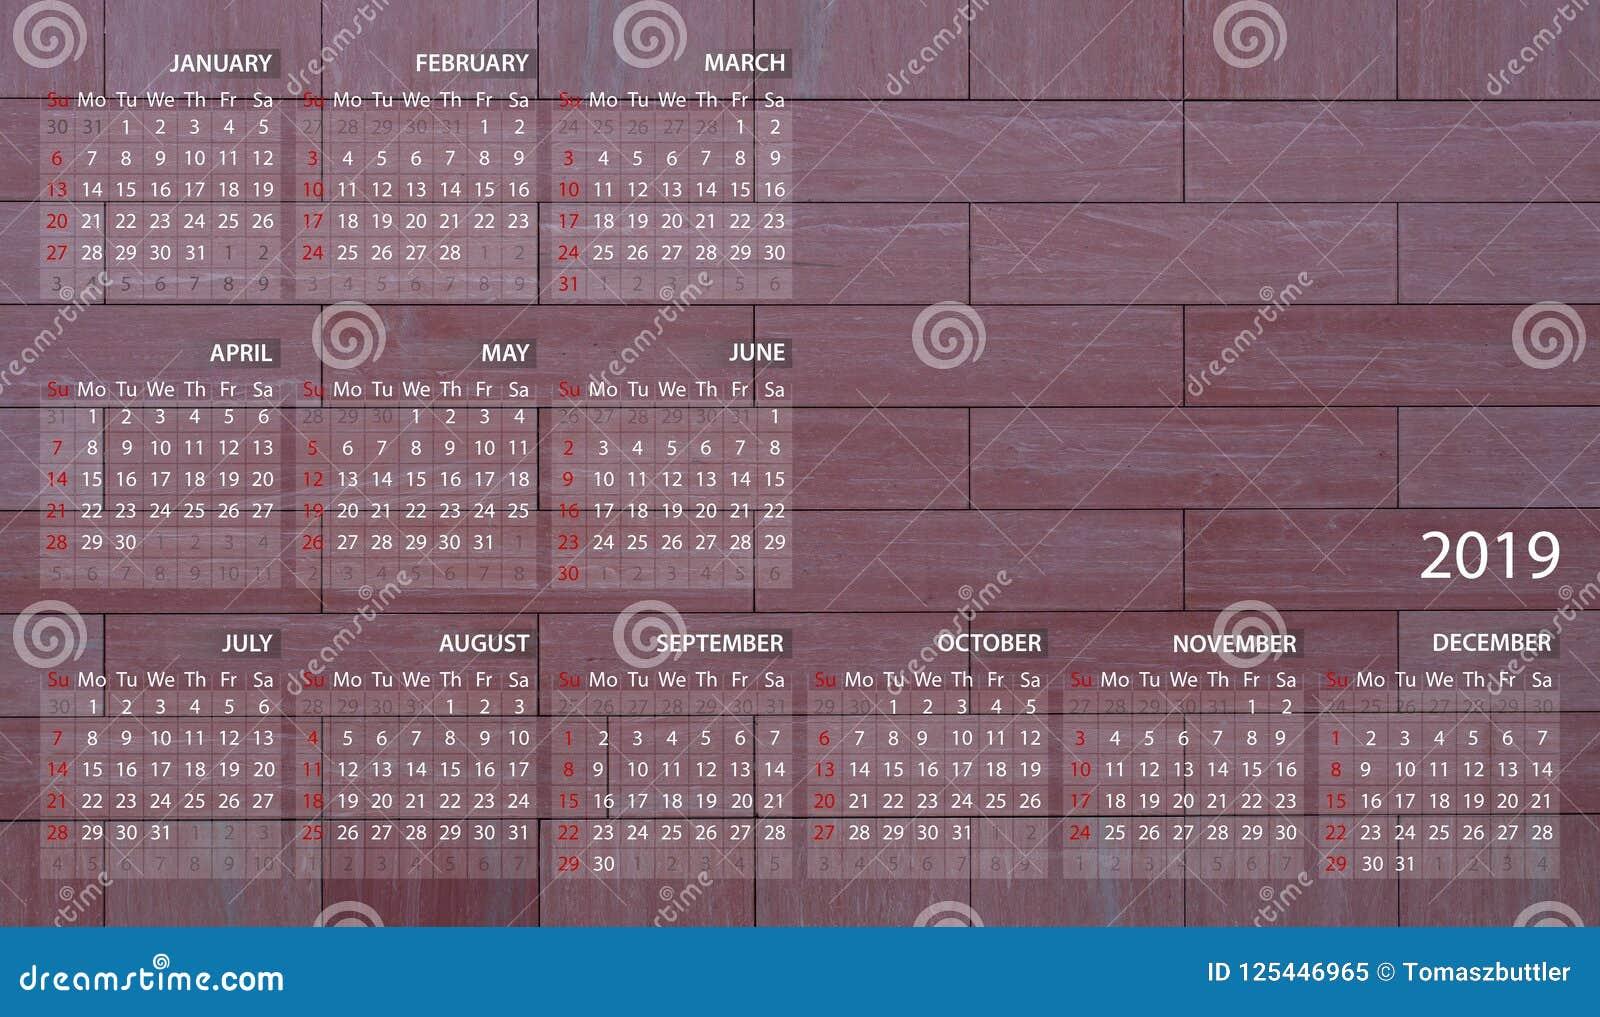 Terminal 5 Calendar.Business Calendar In English For 2019 Illustration Violet Wall